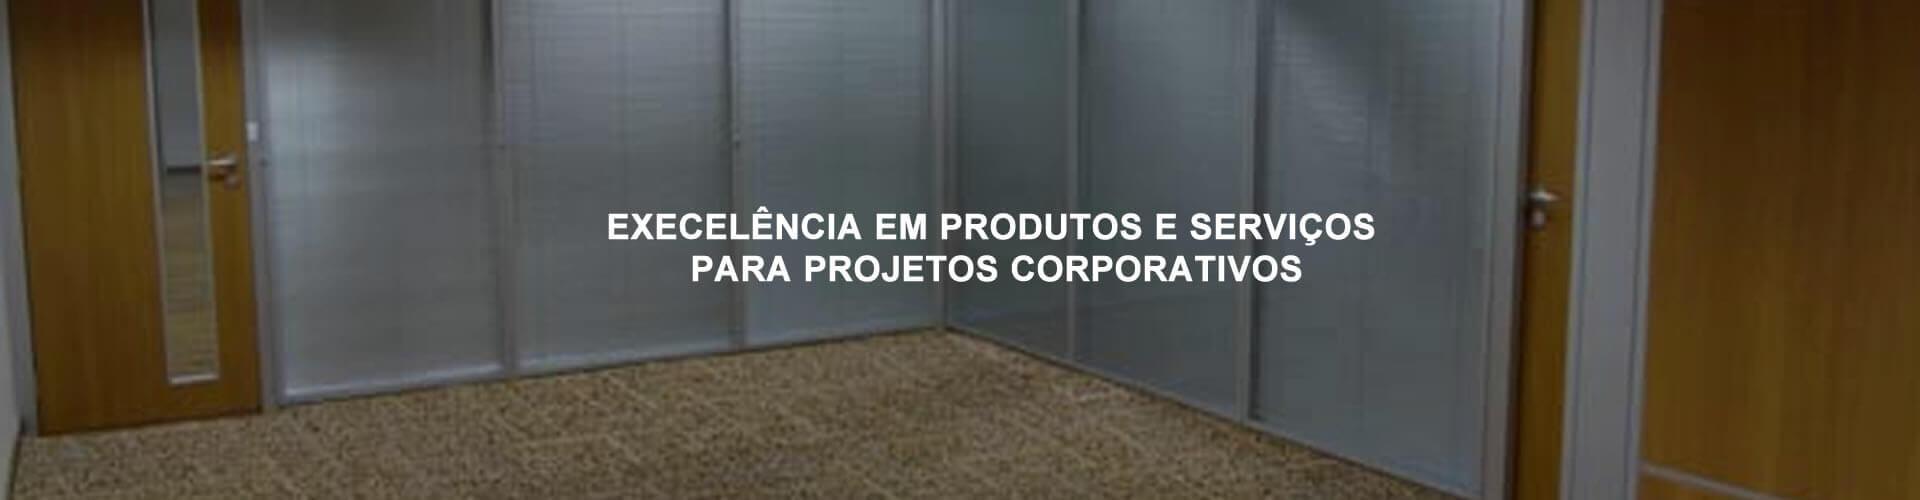 Onairam Ambientes Corporativos